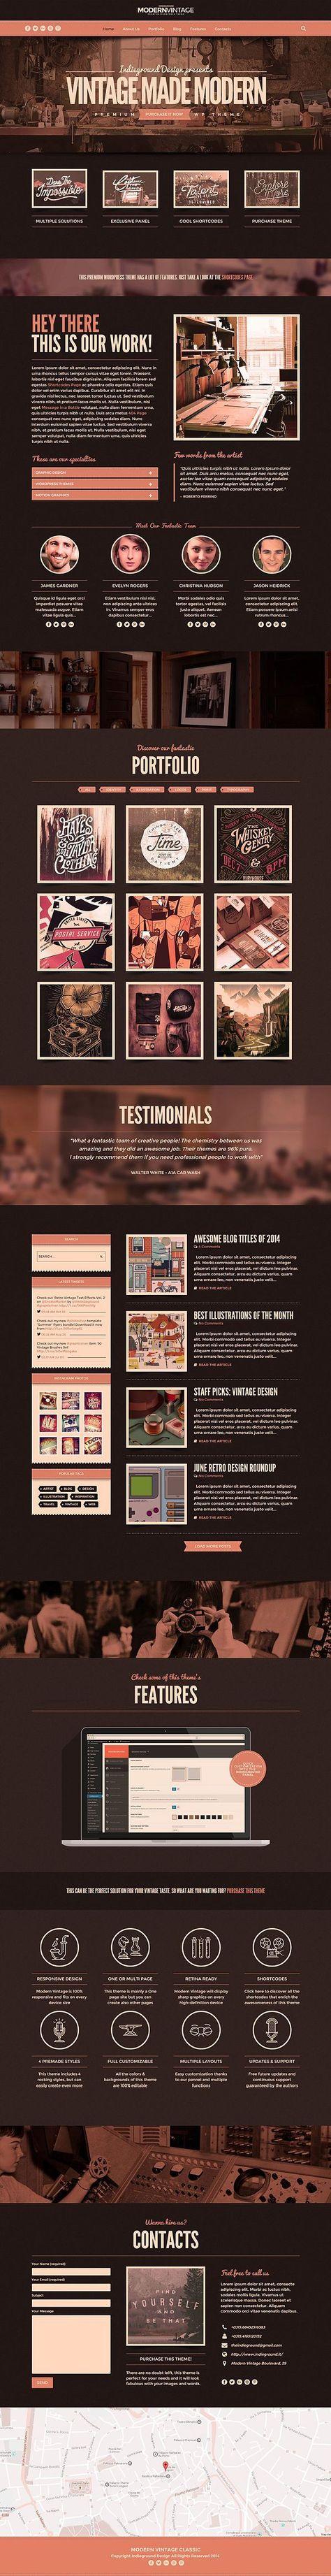 pinterest.com/fra411 #webdesign  Modern Vintage WordPress Theme on Behance - Wordpress Magazine Theme - Ideas of Wordpress Magazine Theme #wordpresstheme #magazinetheme -   pinterest.com/fra411 #webdesign  Modern Vintage WordPress Theme on Behance